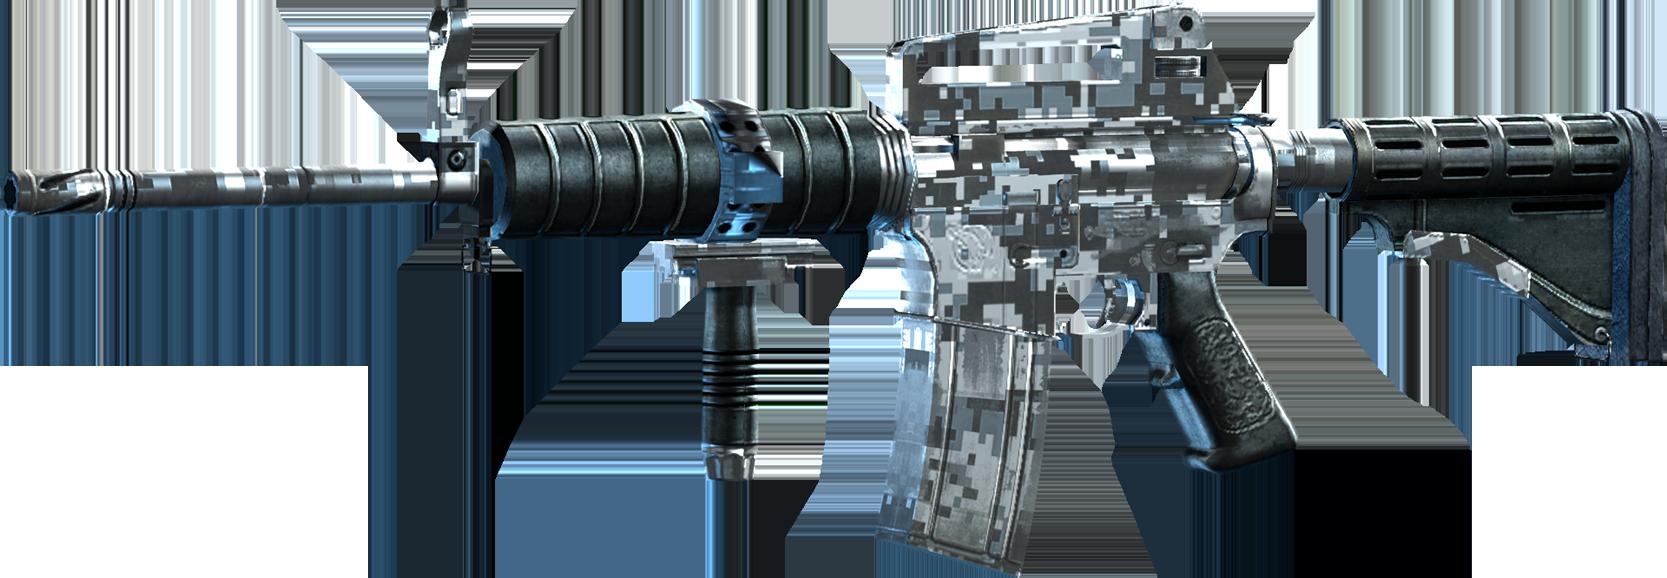 Big Guns PNG - 158432